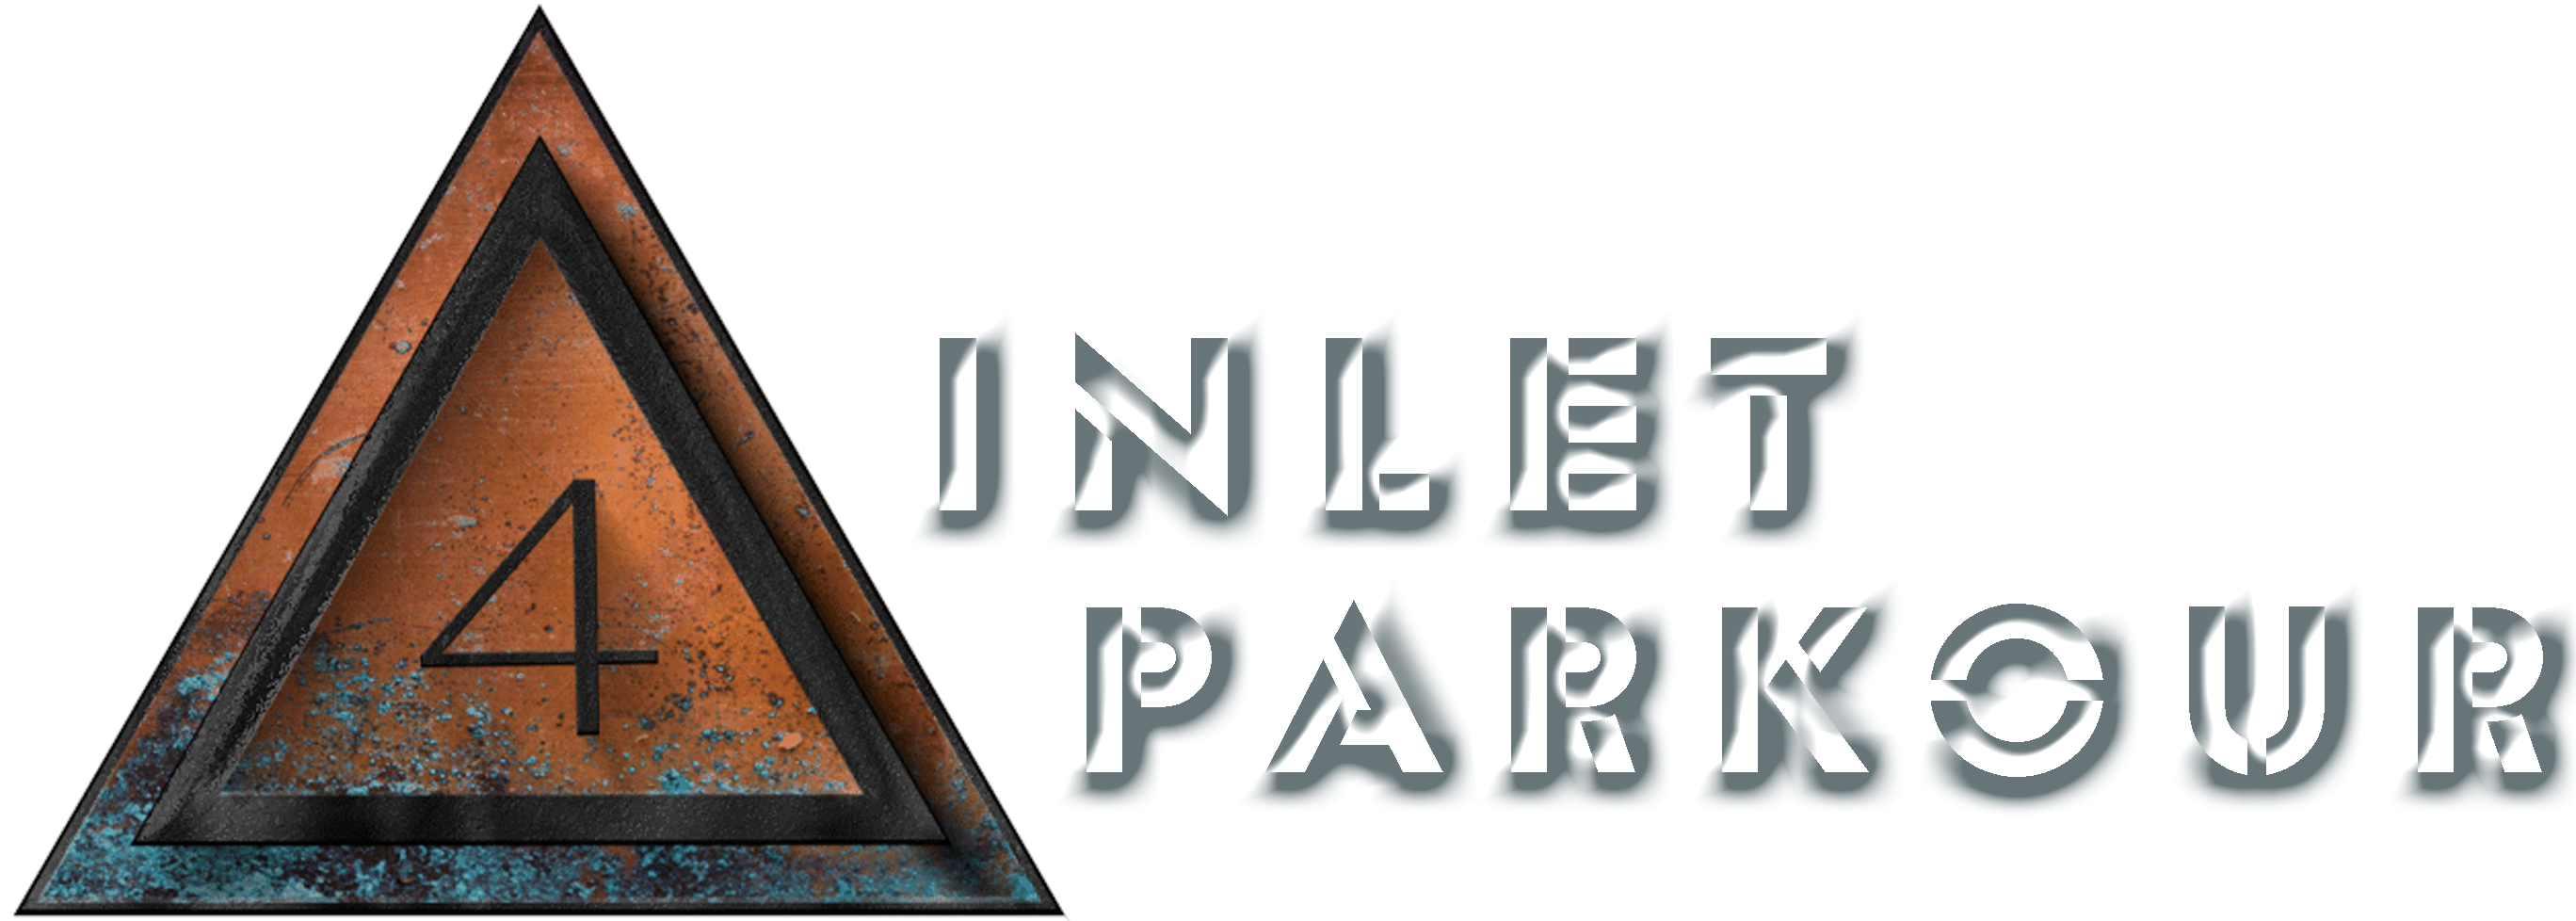 Inlet Parkour